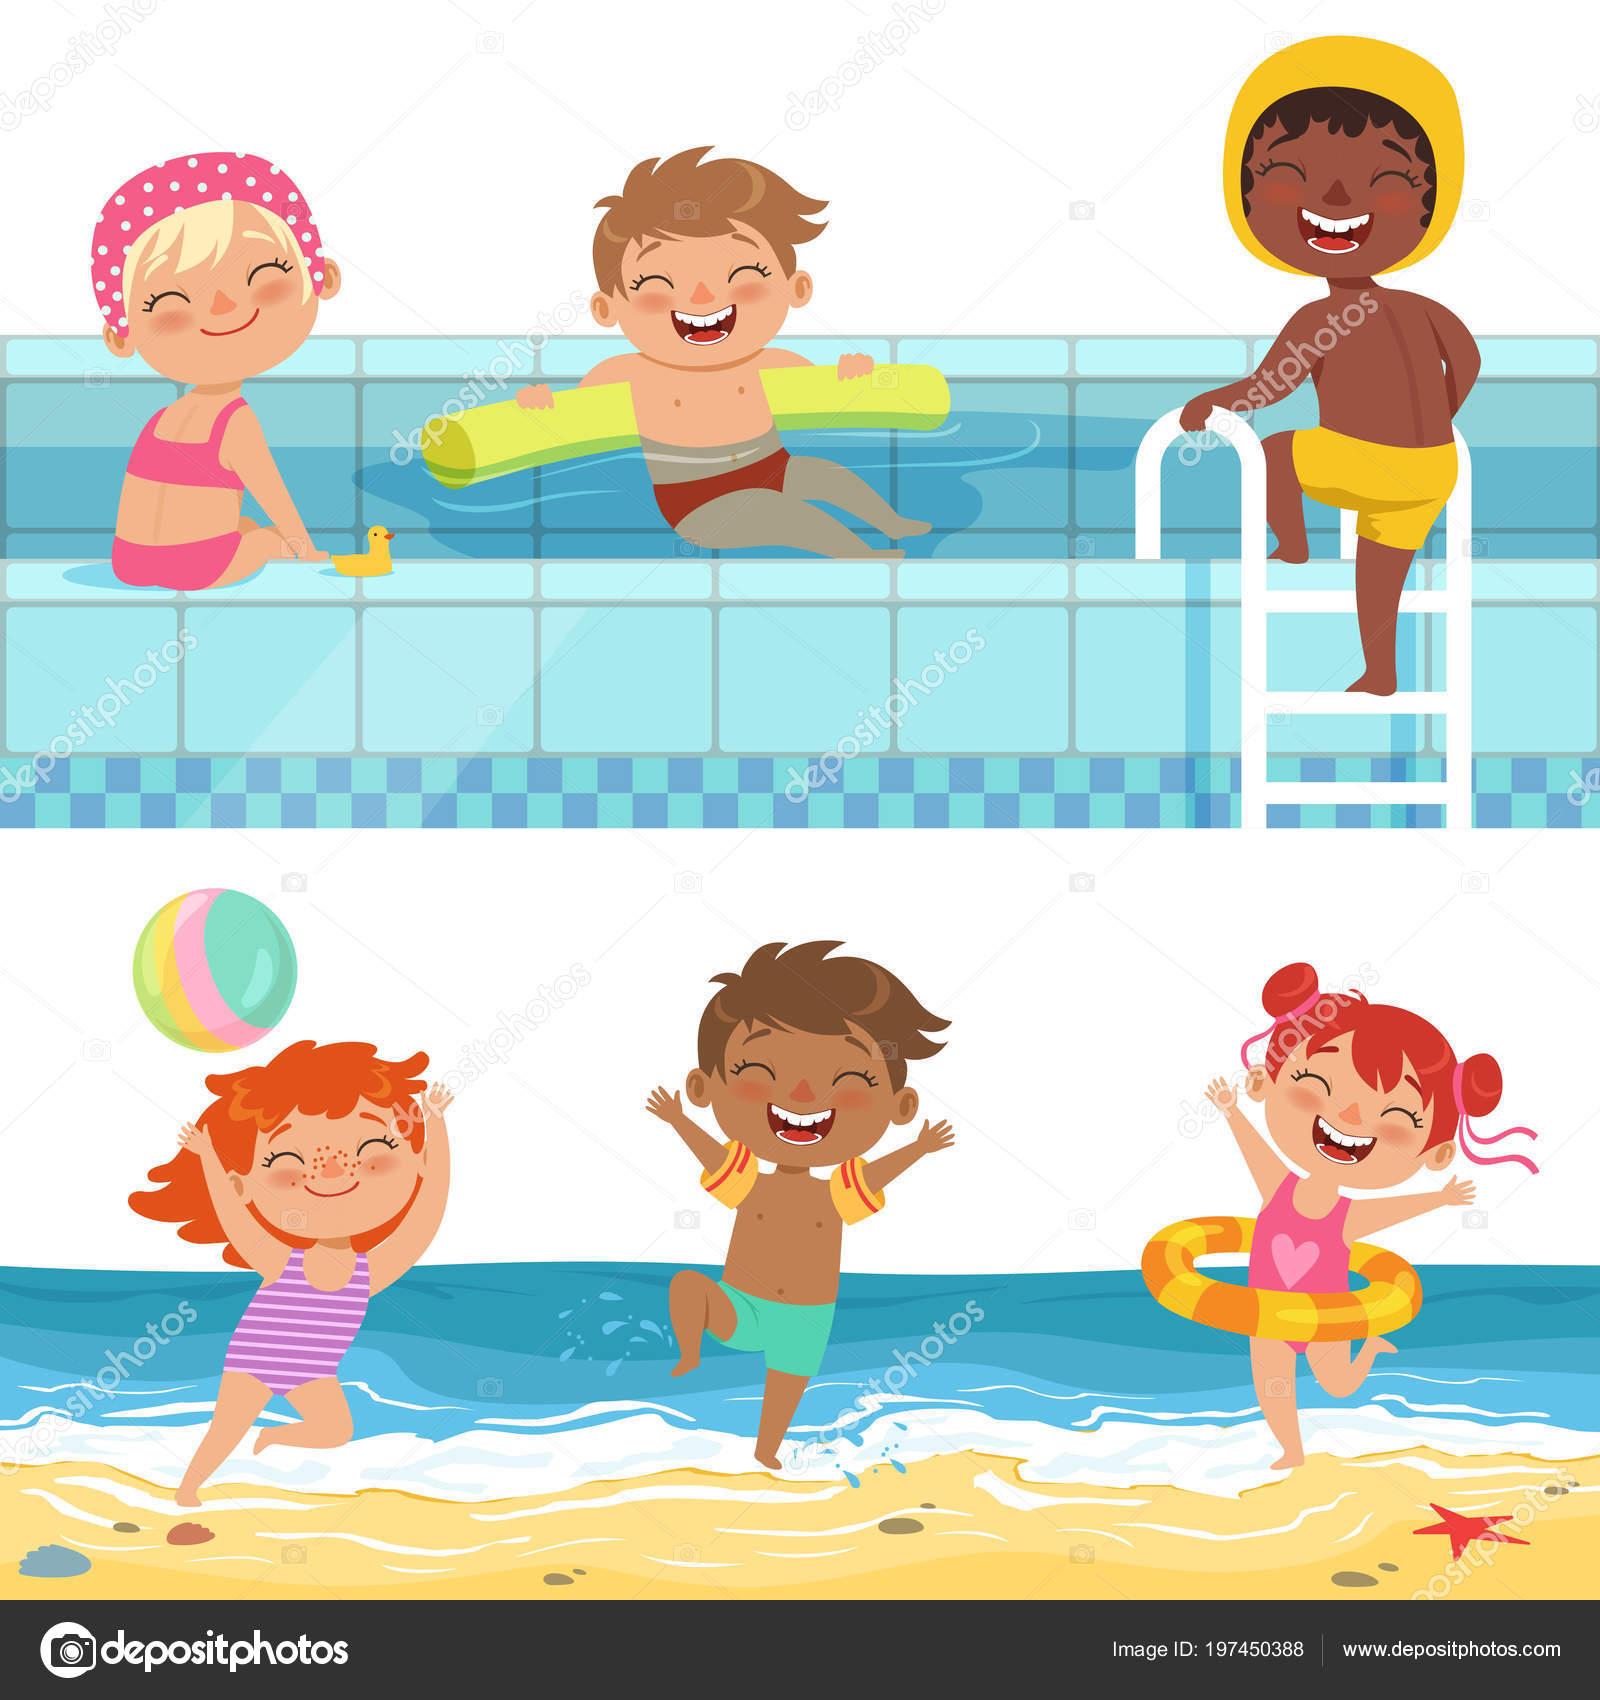 Letni Vodni Hry V Aquaparku Ilustrace Kreslene Vtipne Deti Stock